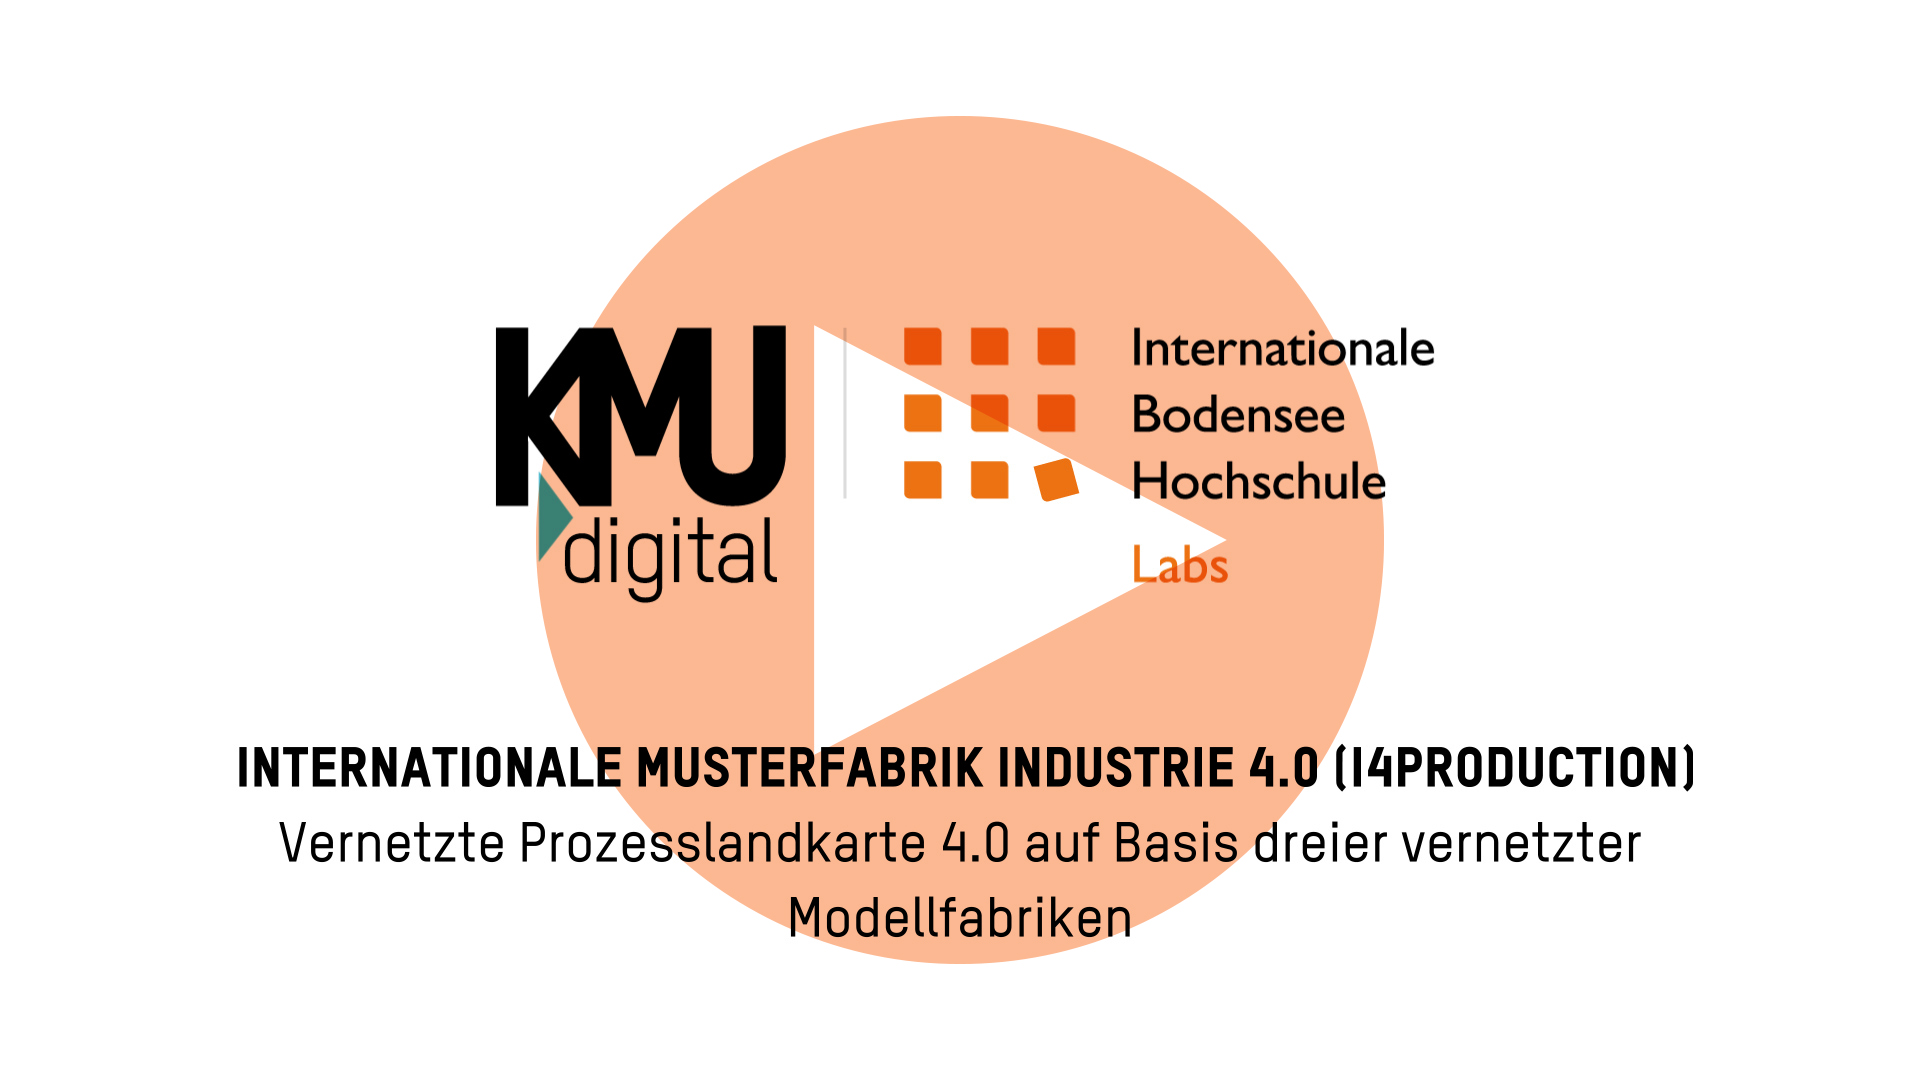 IBH-Lab KMUdigital i4production